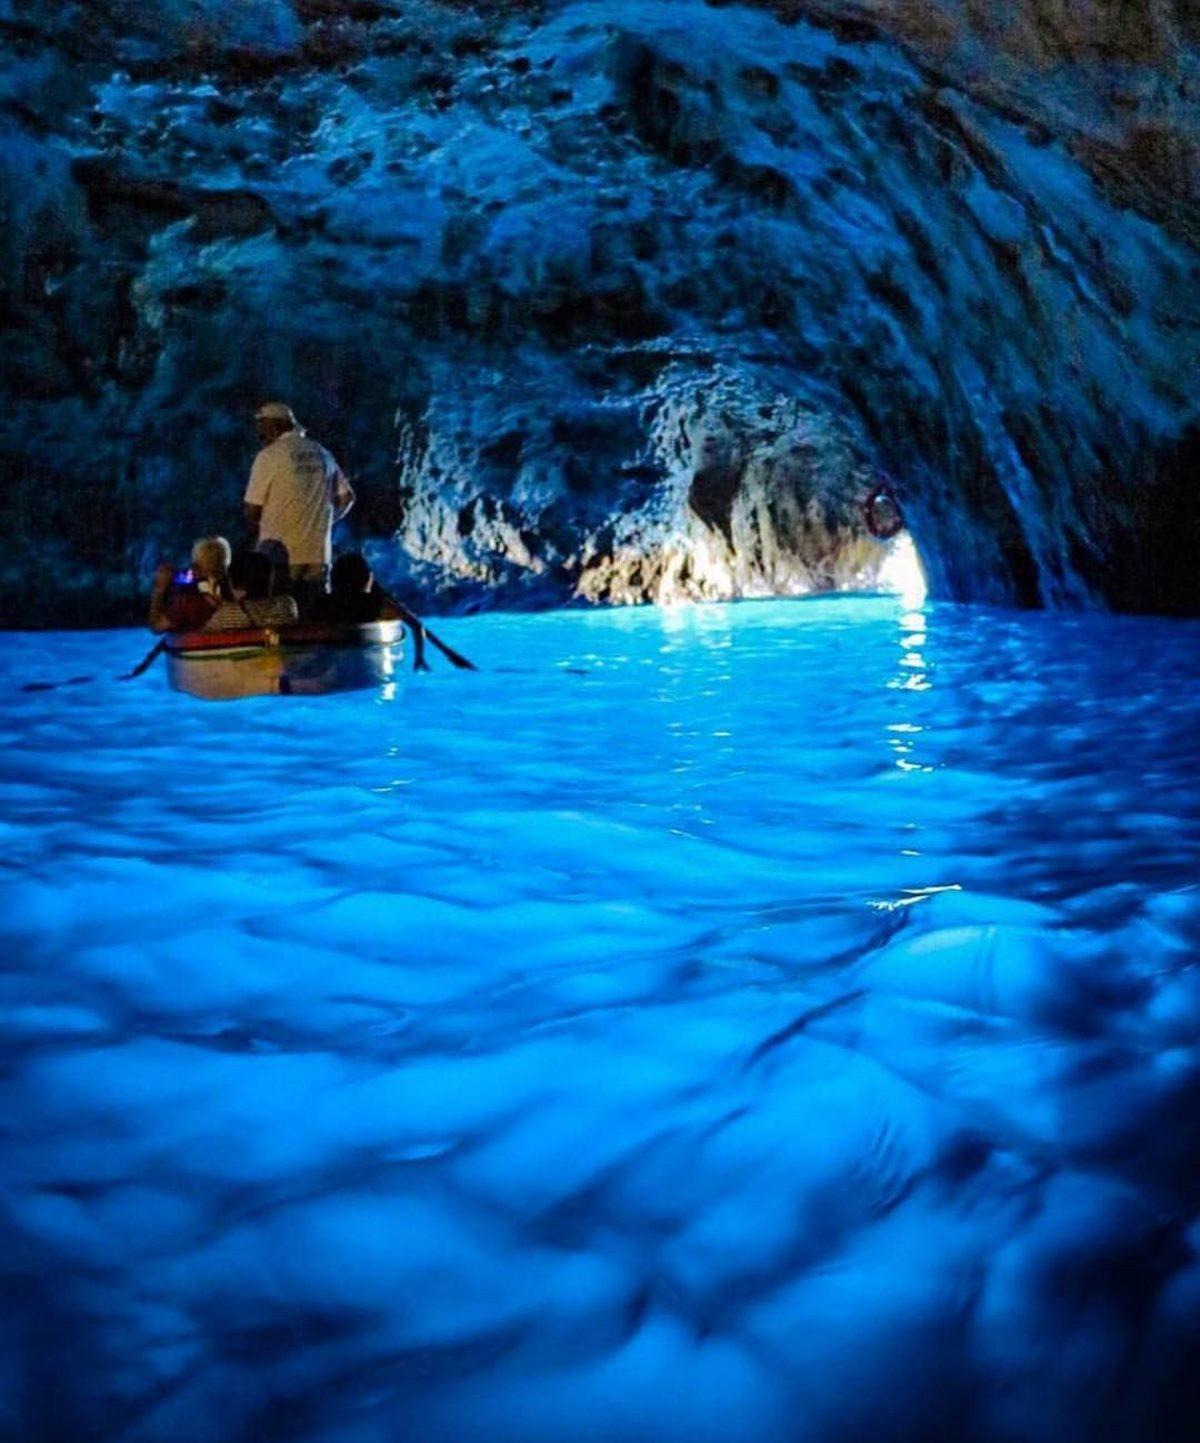 Blue Grotto, Κάπρι, Ιταλία